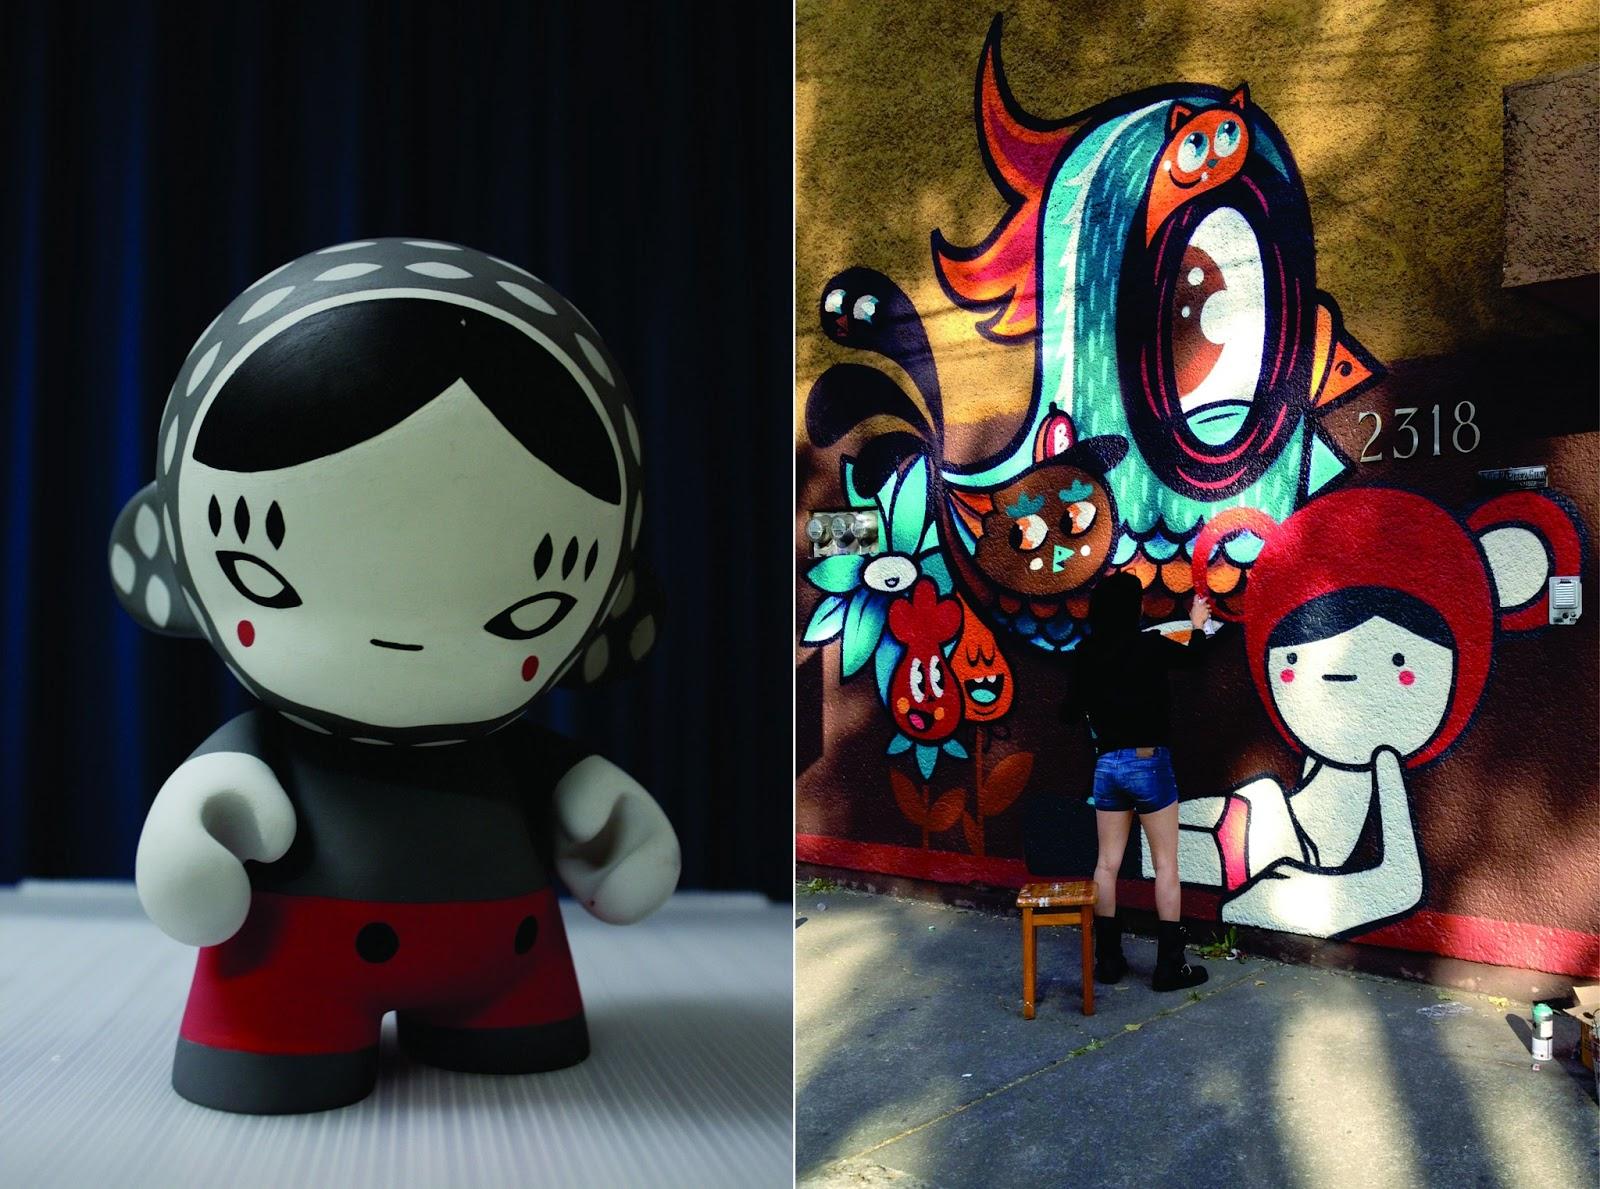 Itzel Mexican Illustration and Art